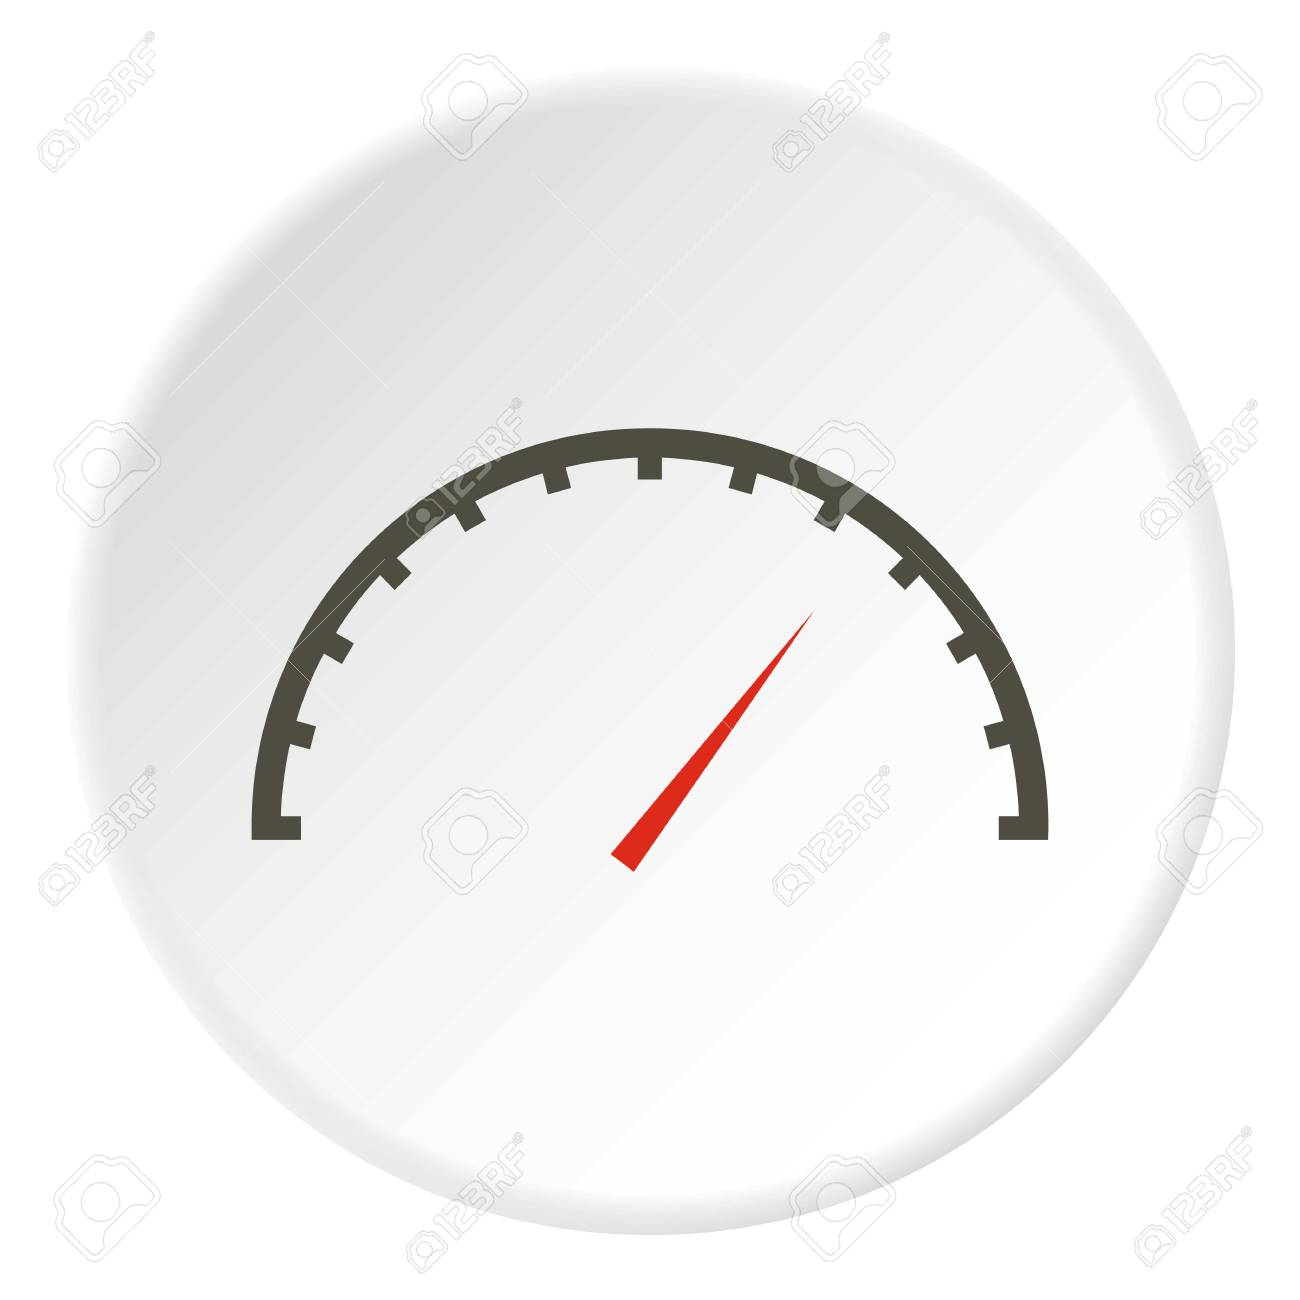 Factory Speedometer Icon Flat Illustration Of Factory Speedometer